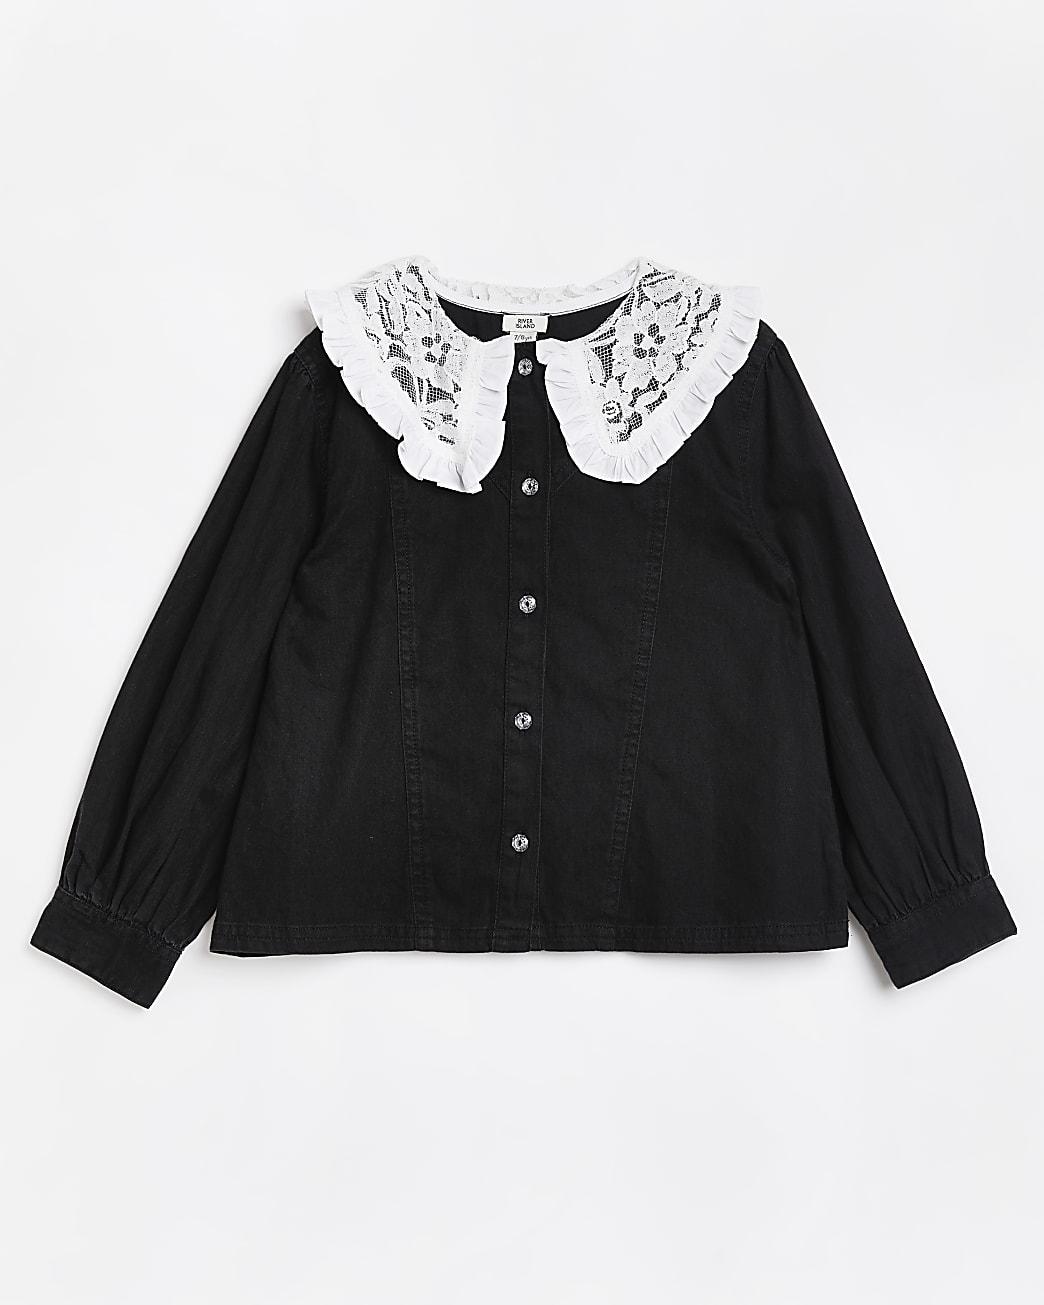 Girls lack lace collar shirt